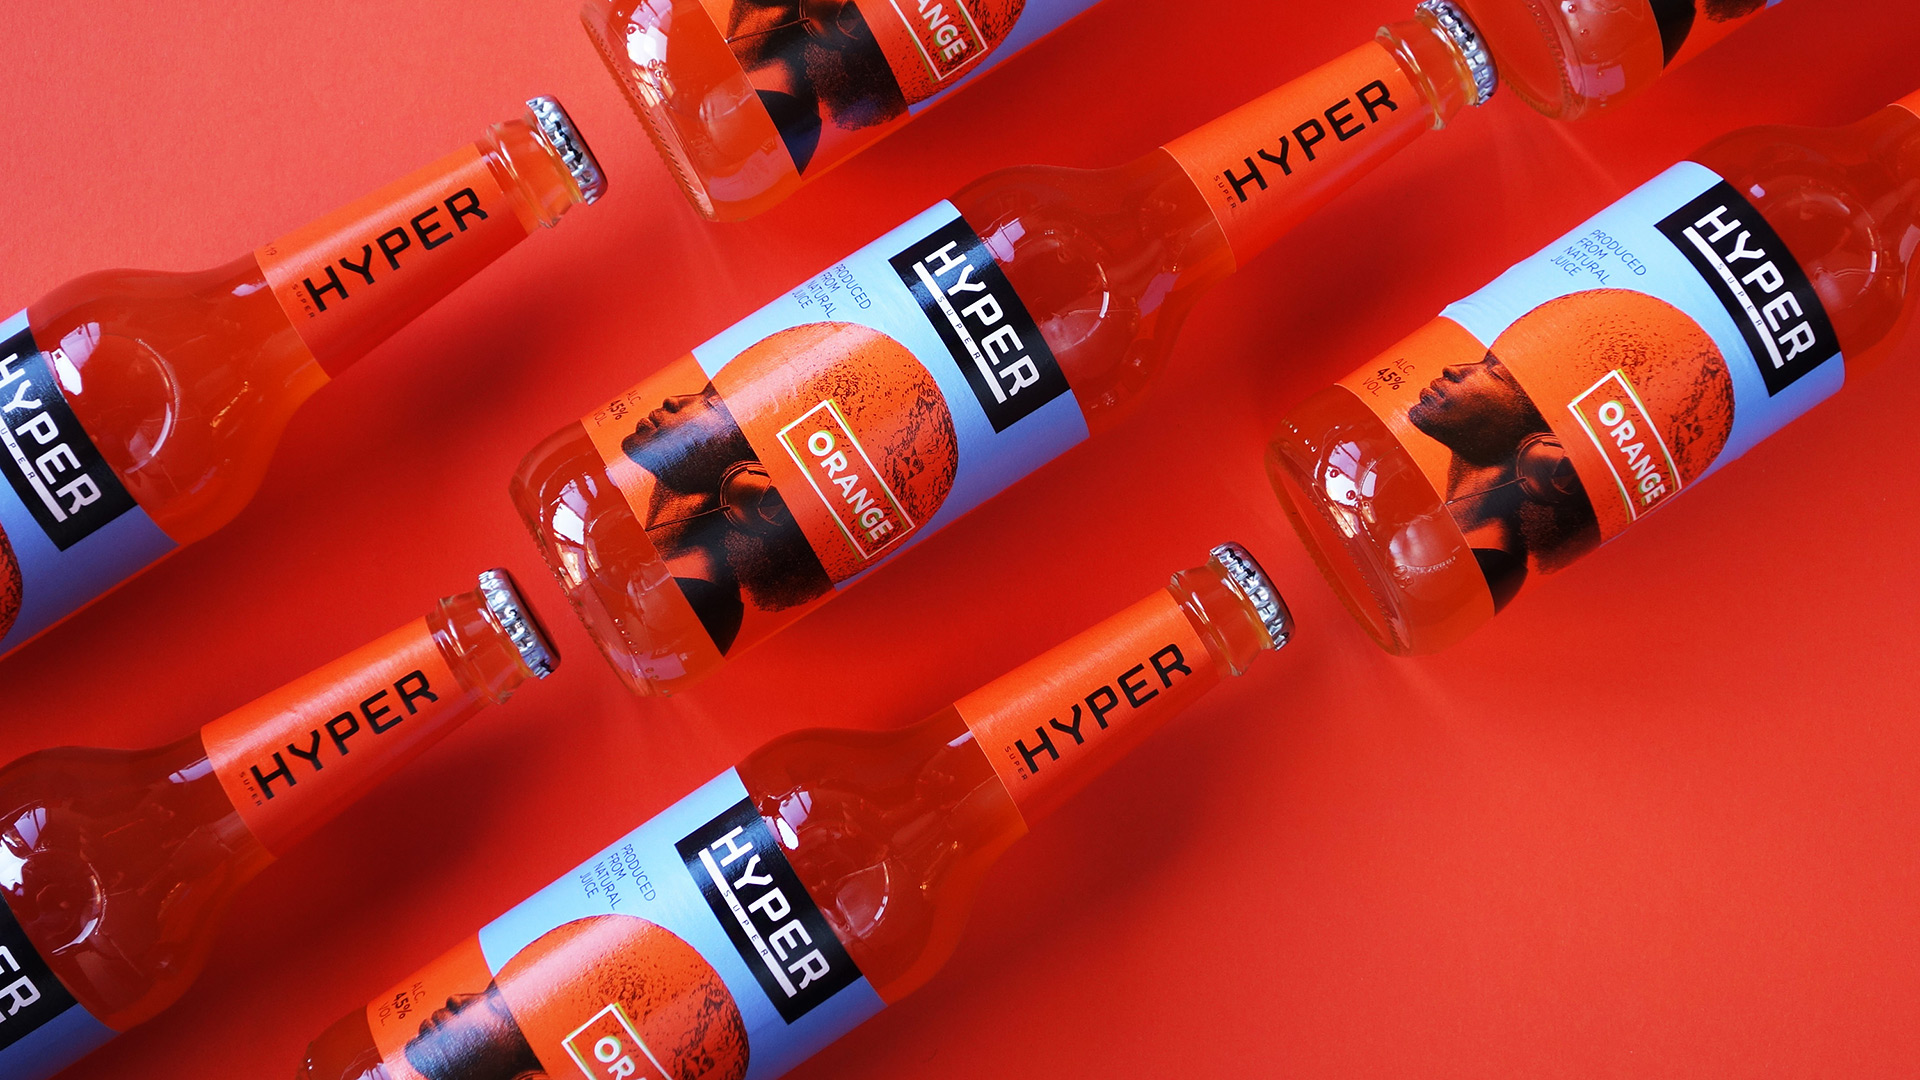 Asgard Branding, packaging, illustration, packaging design, head, orange, Hyper,